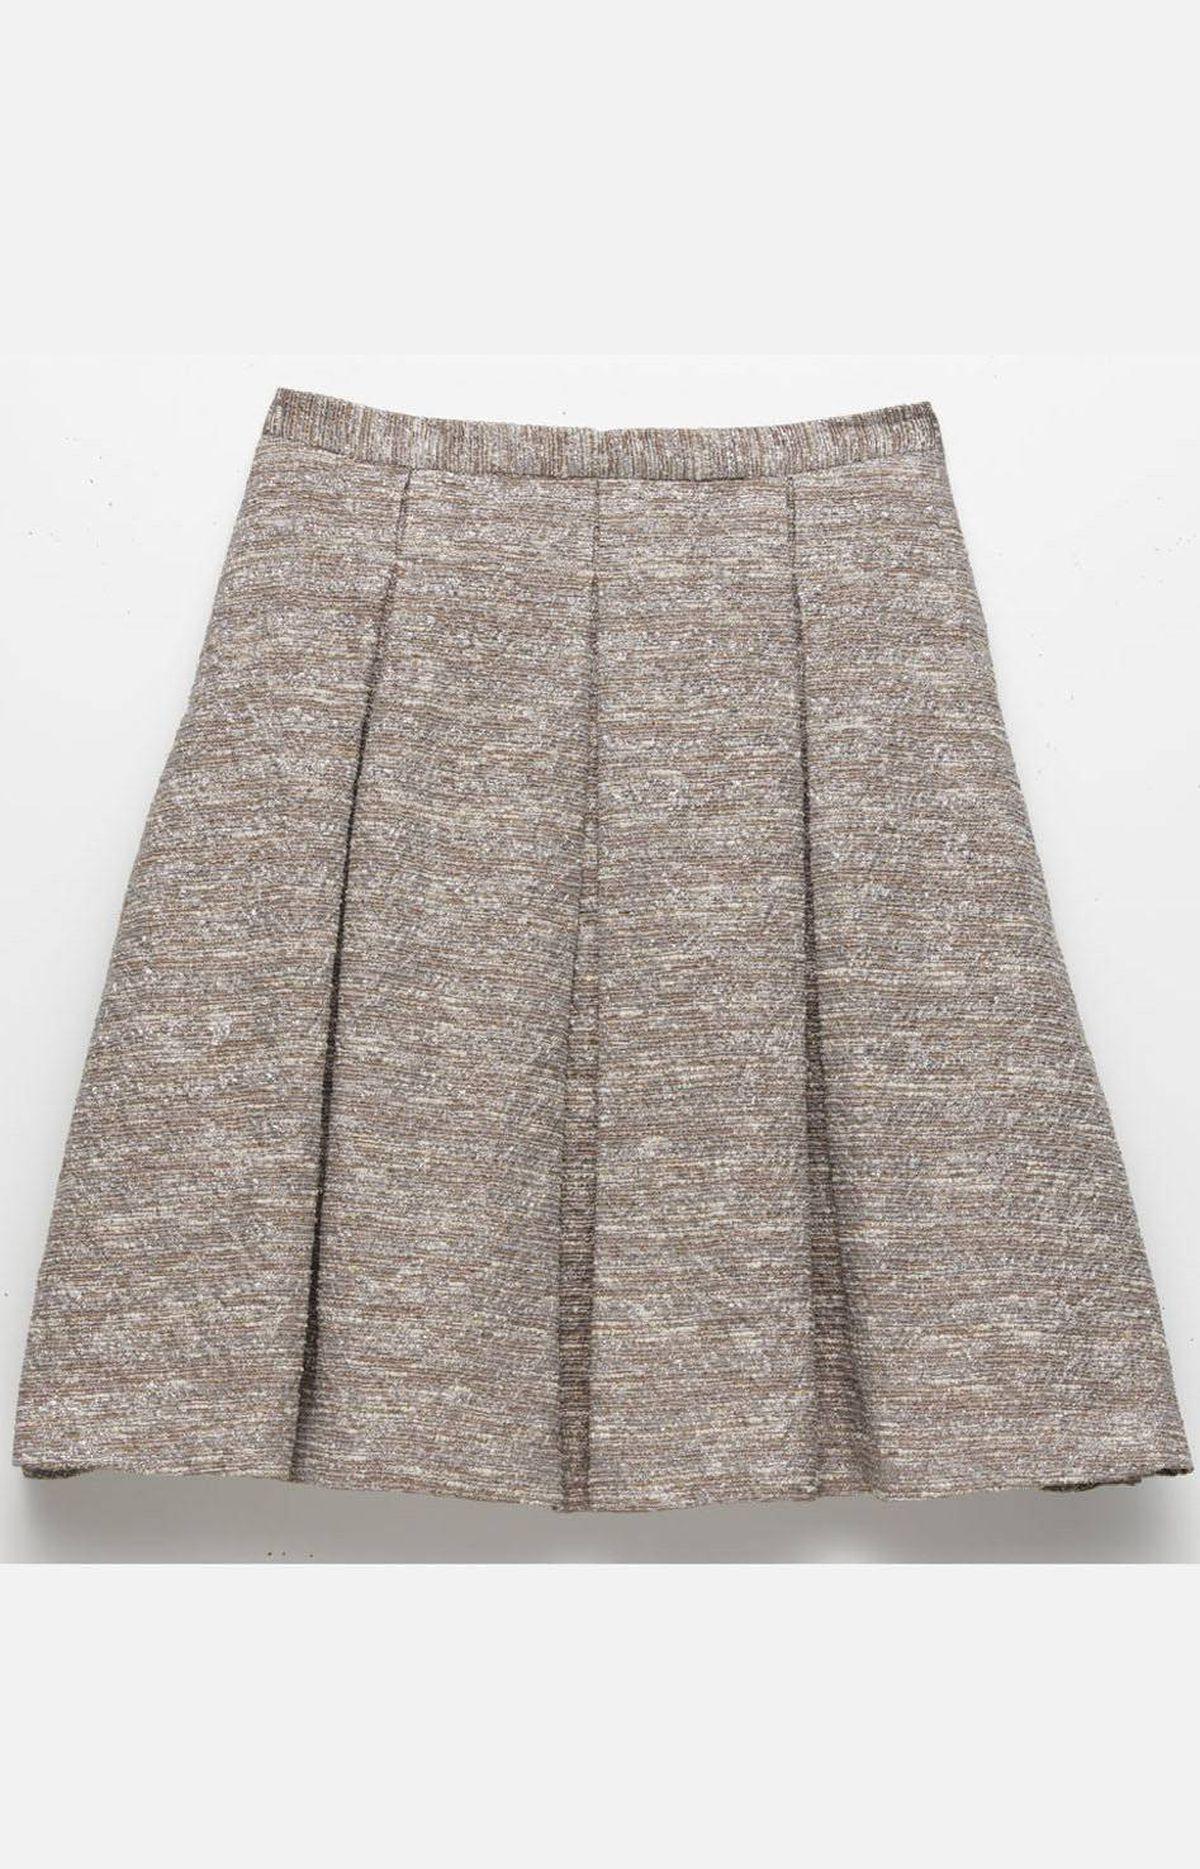 Pleated swing skirt by Dennis Merotto, $425 through www.dennismerotto.com.